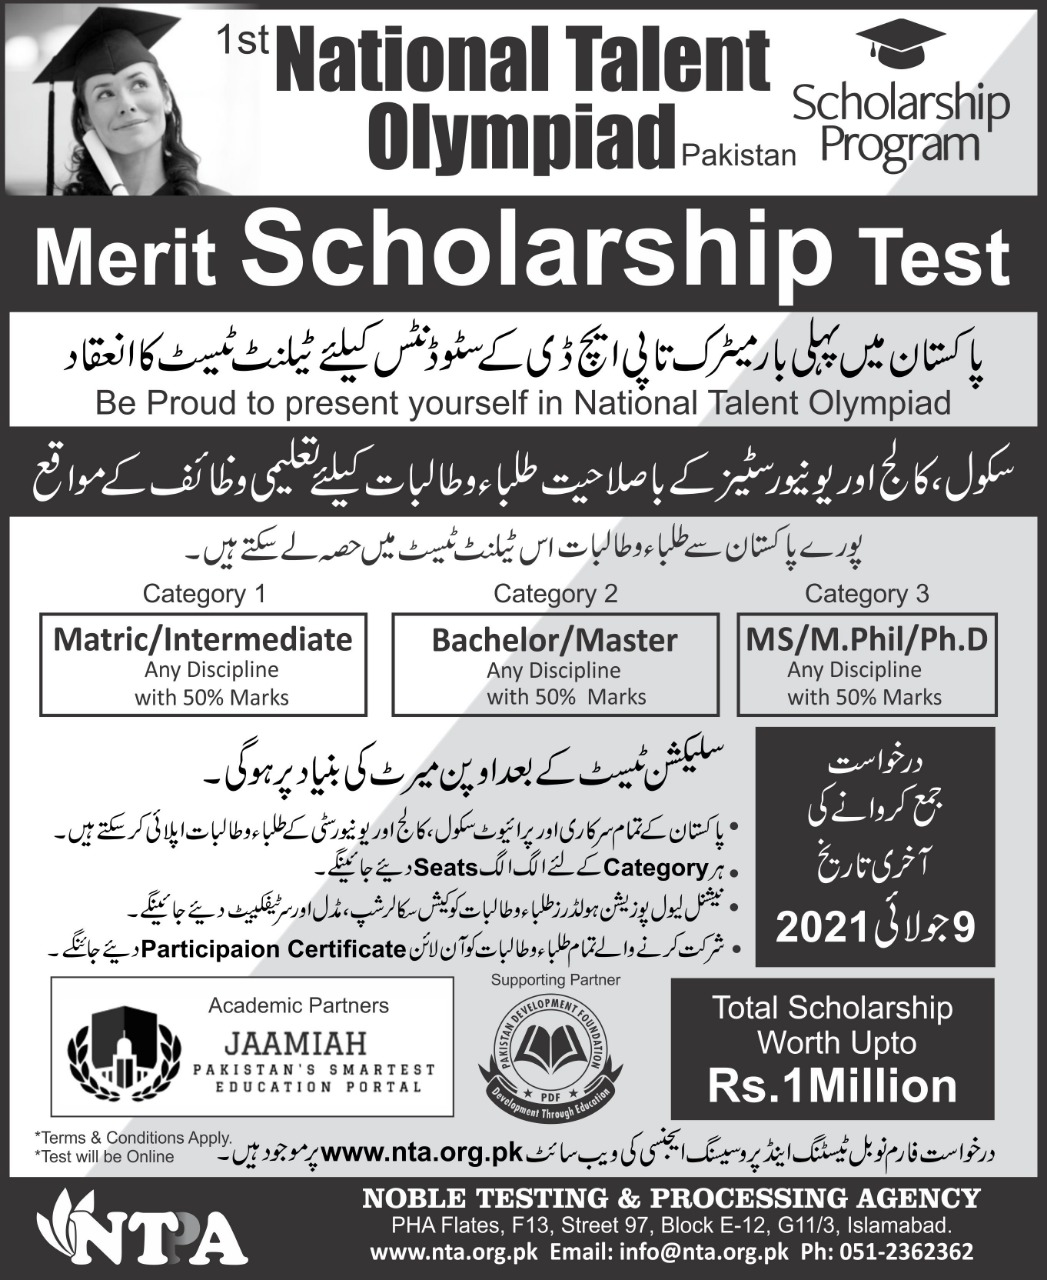 National Talent Olympiad Merit Scholarship